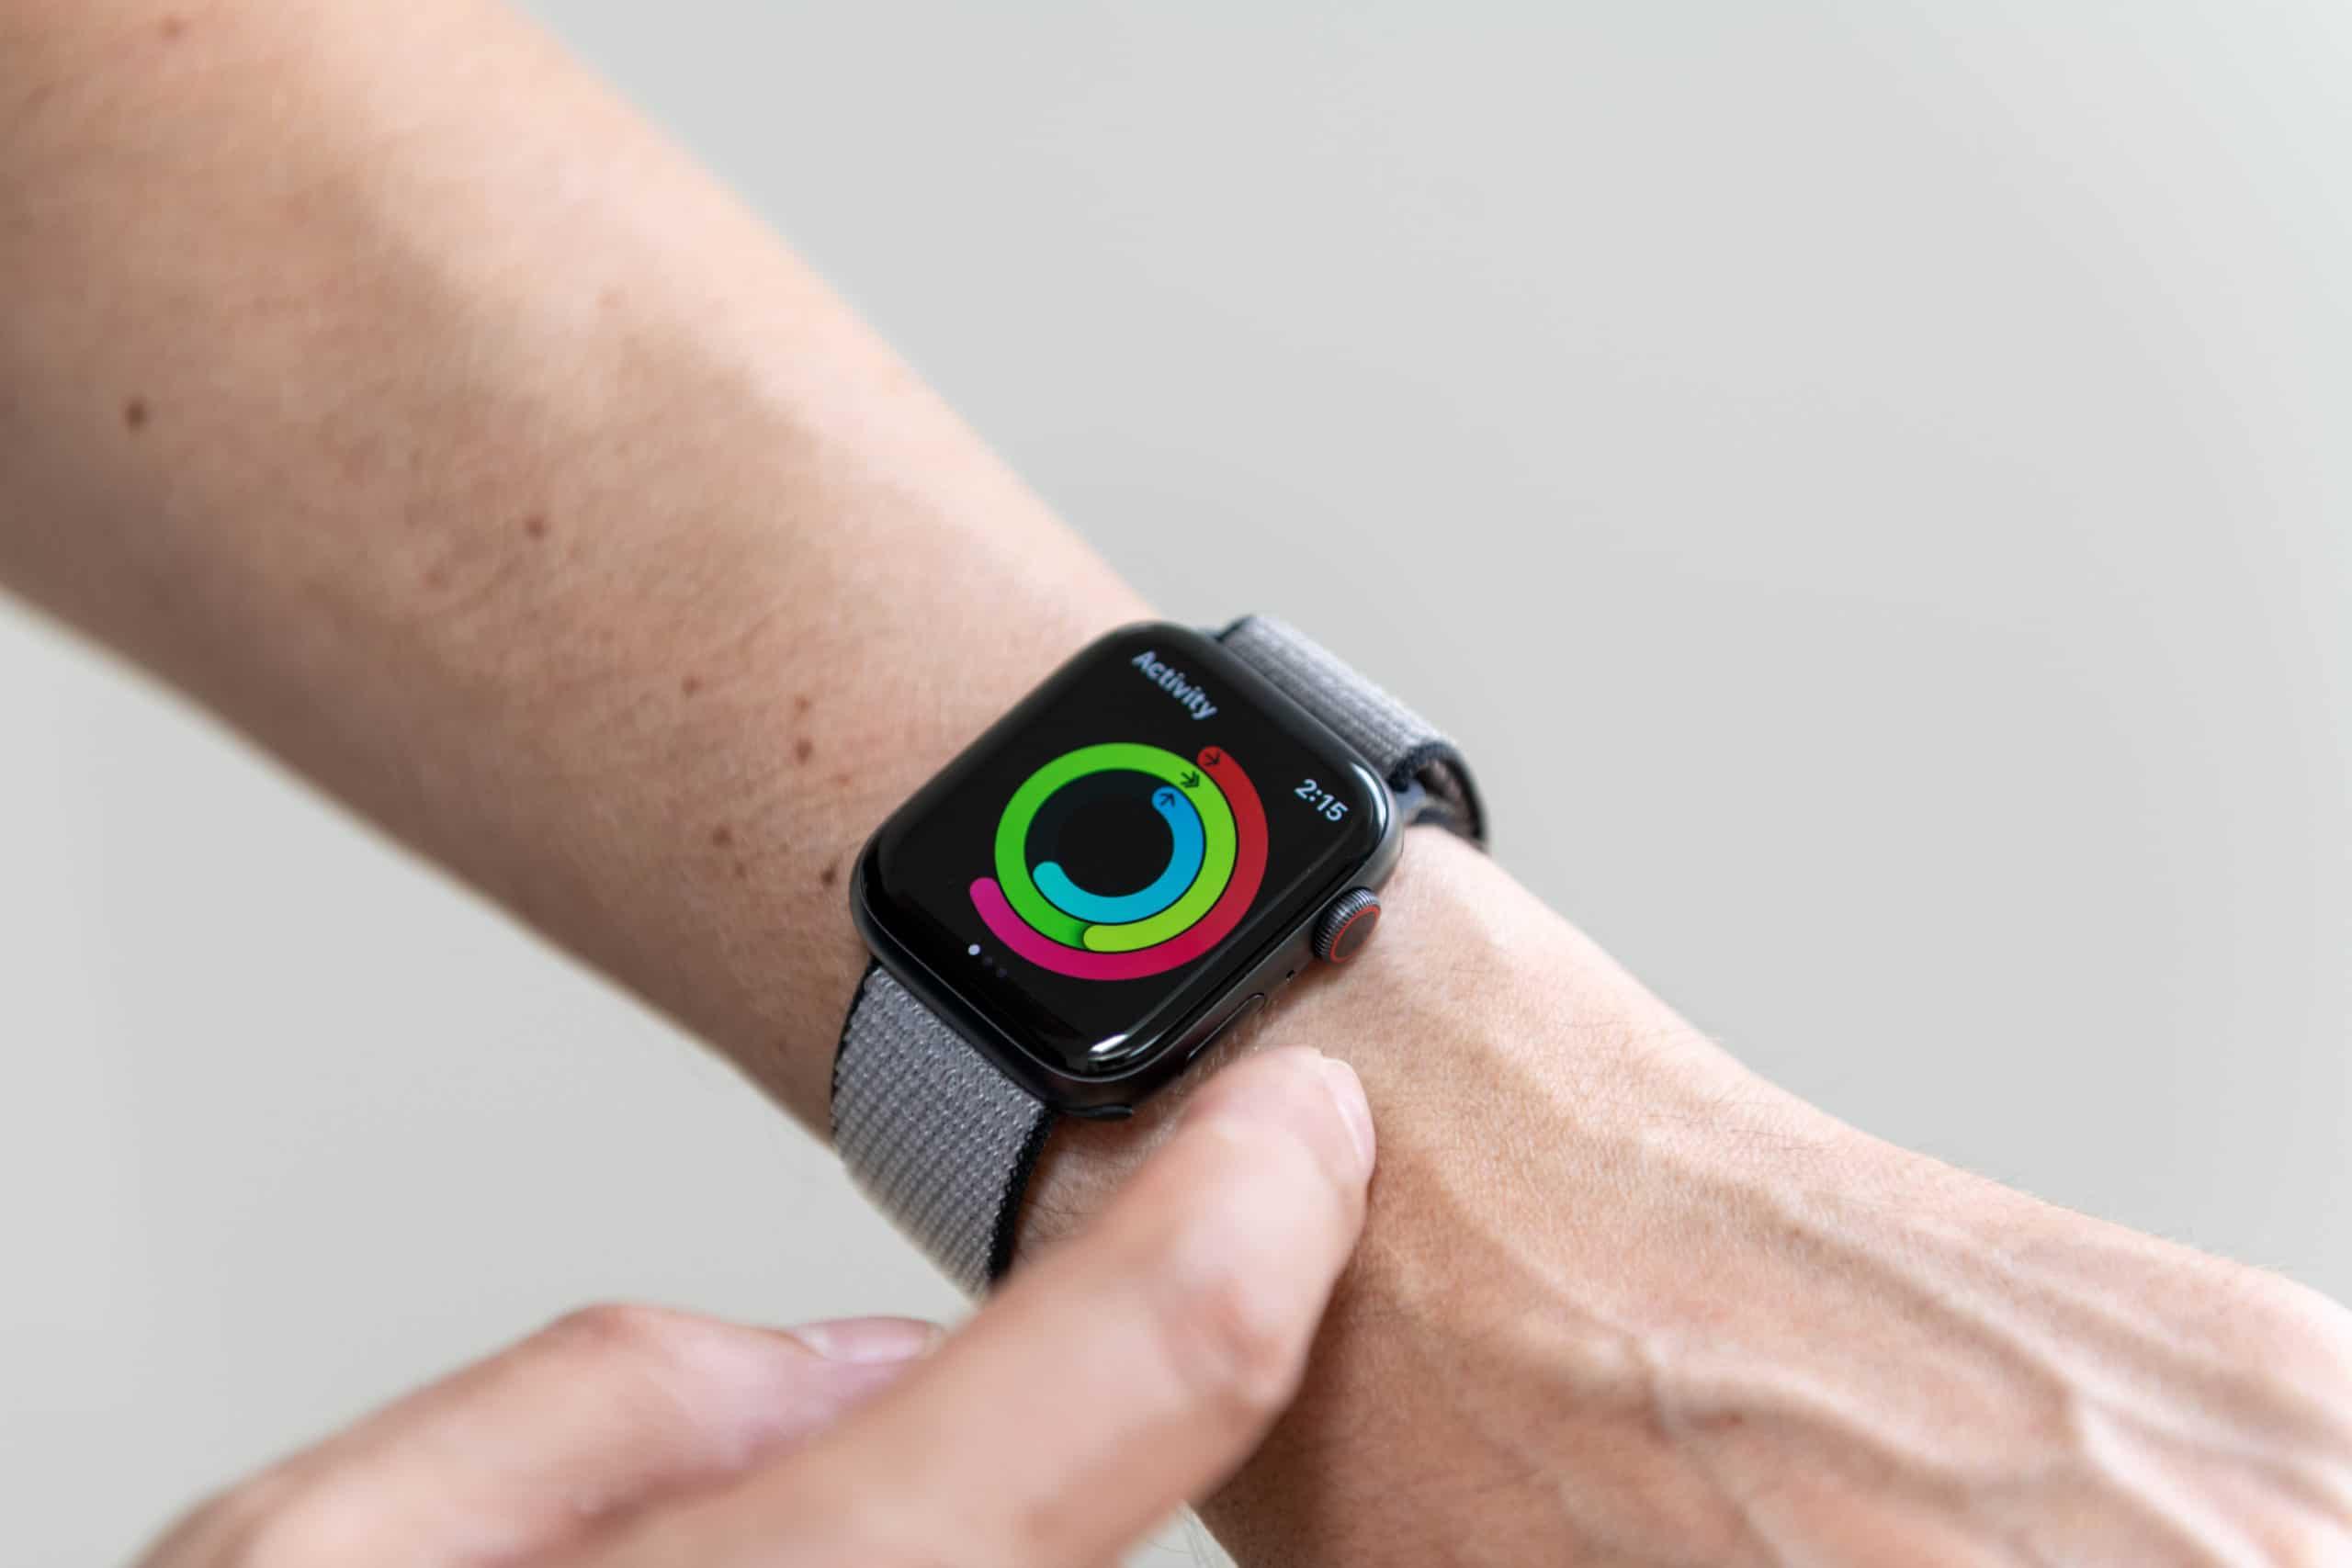 Anéis do Apple Watch